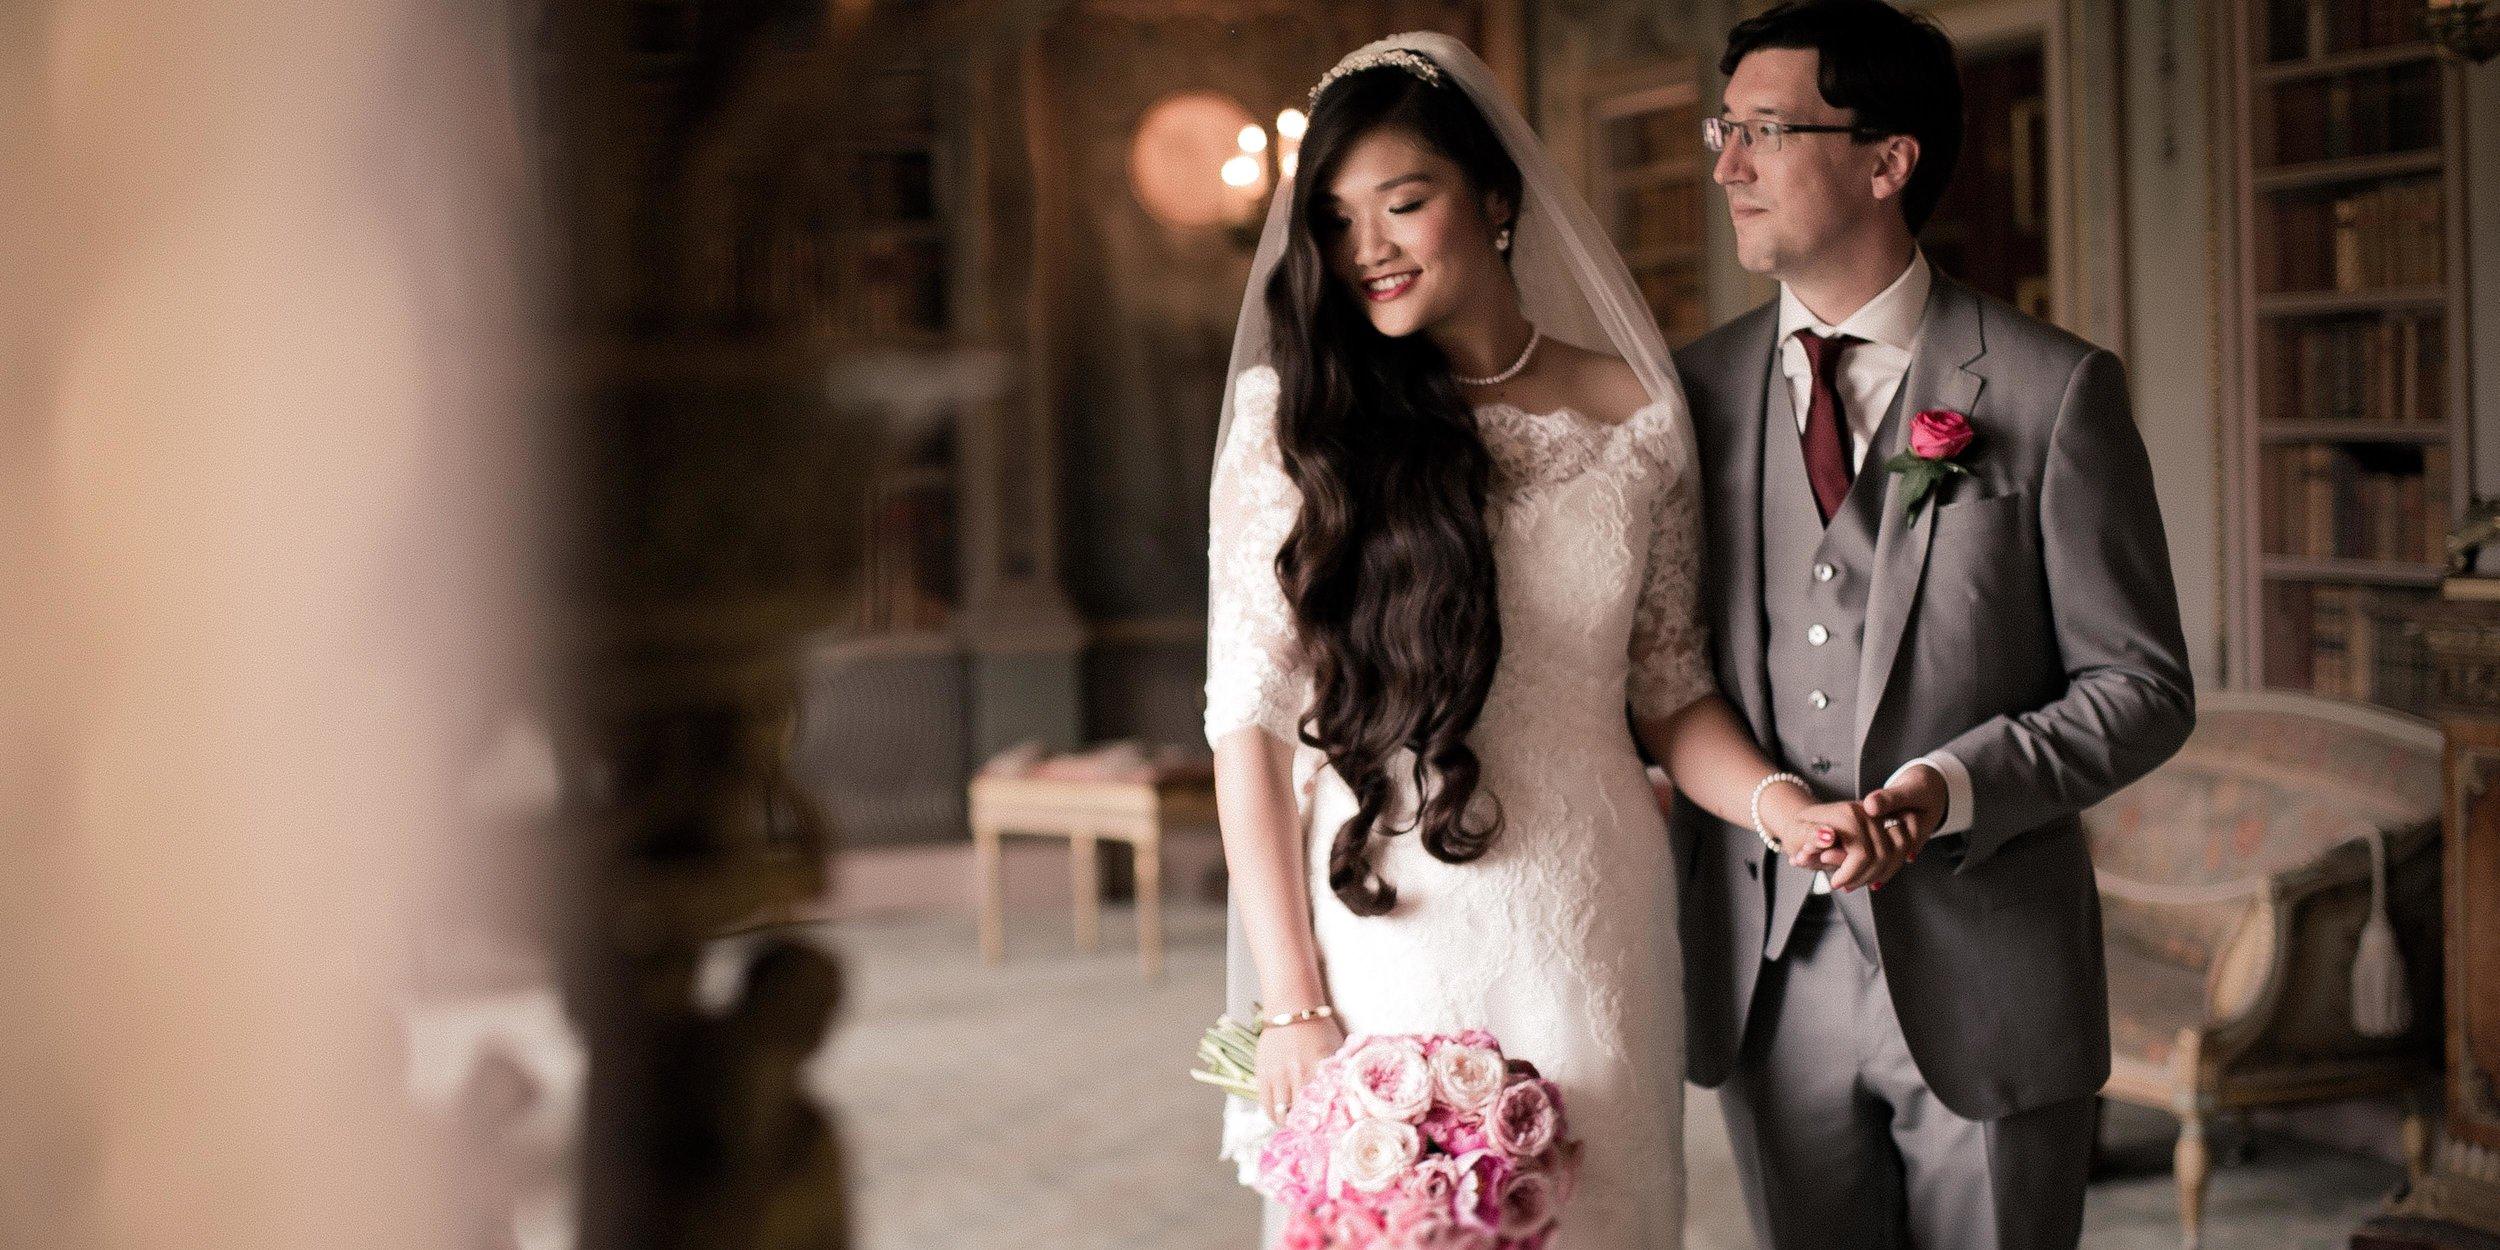 wedding_photographer_surrey_29.jpg